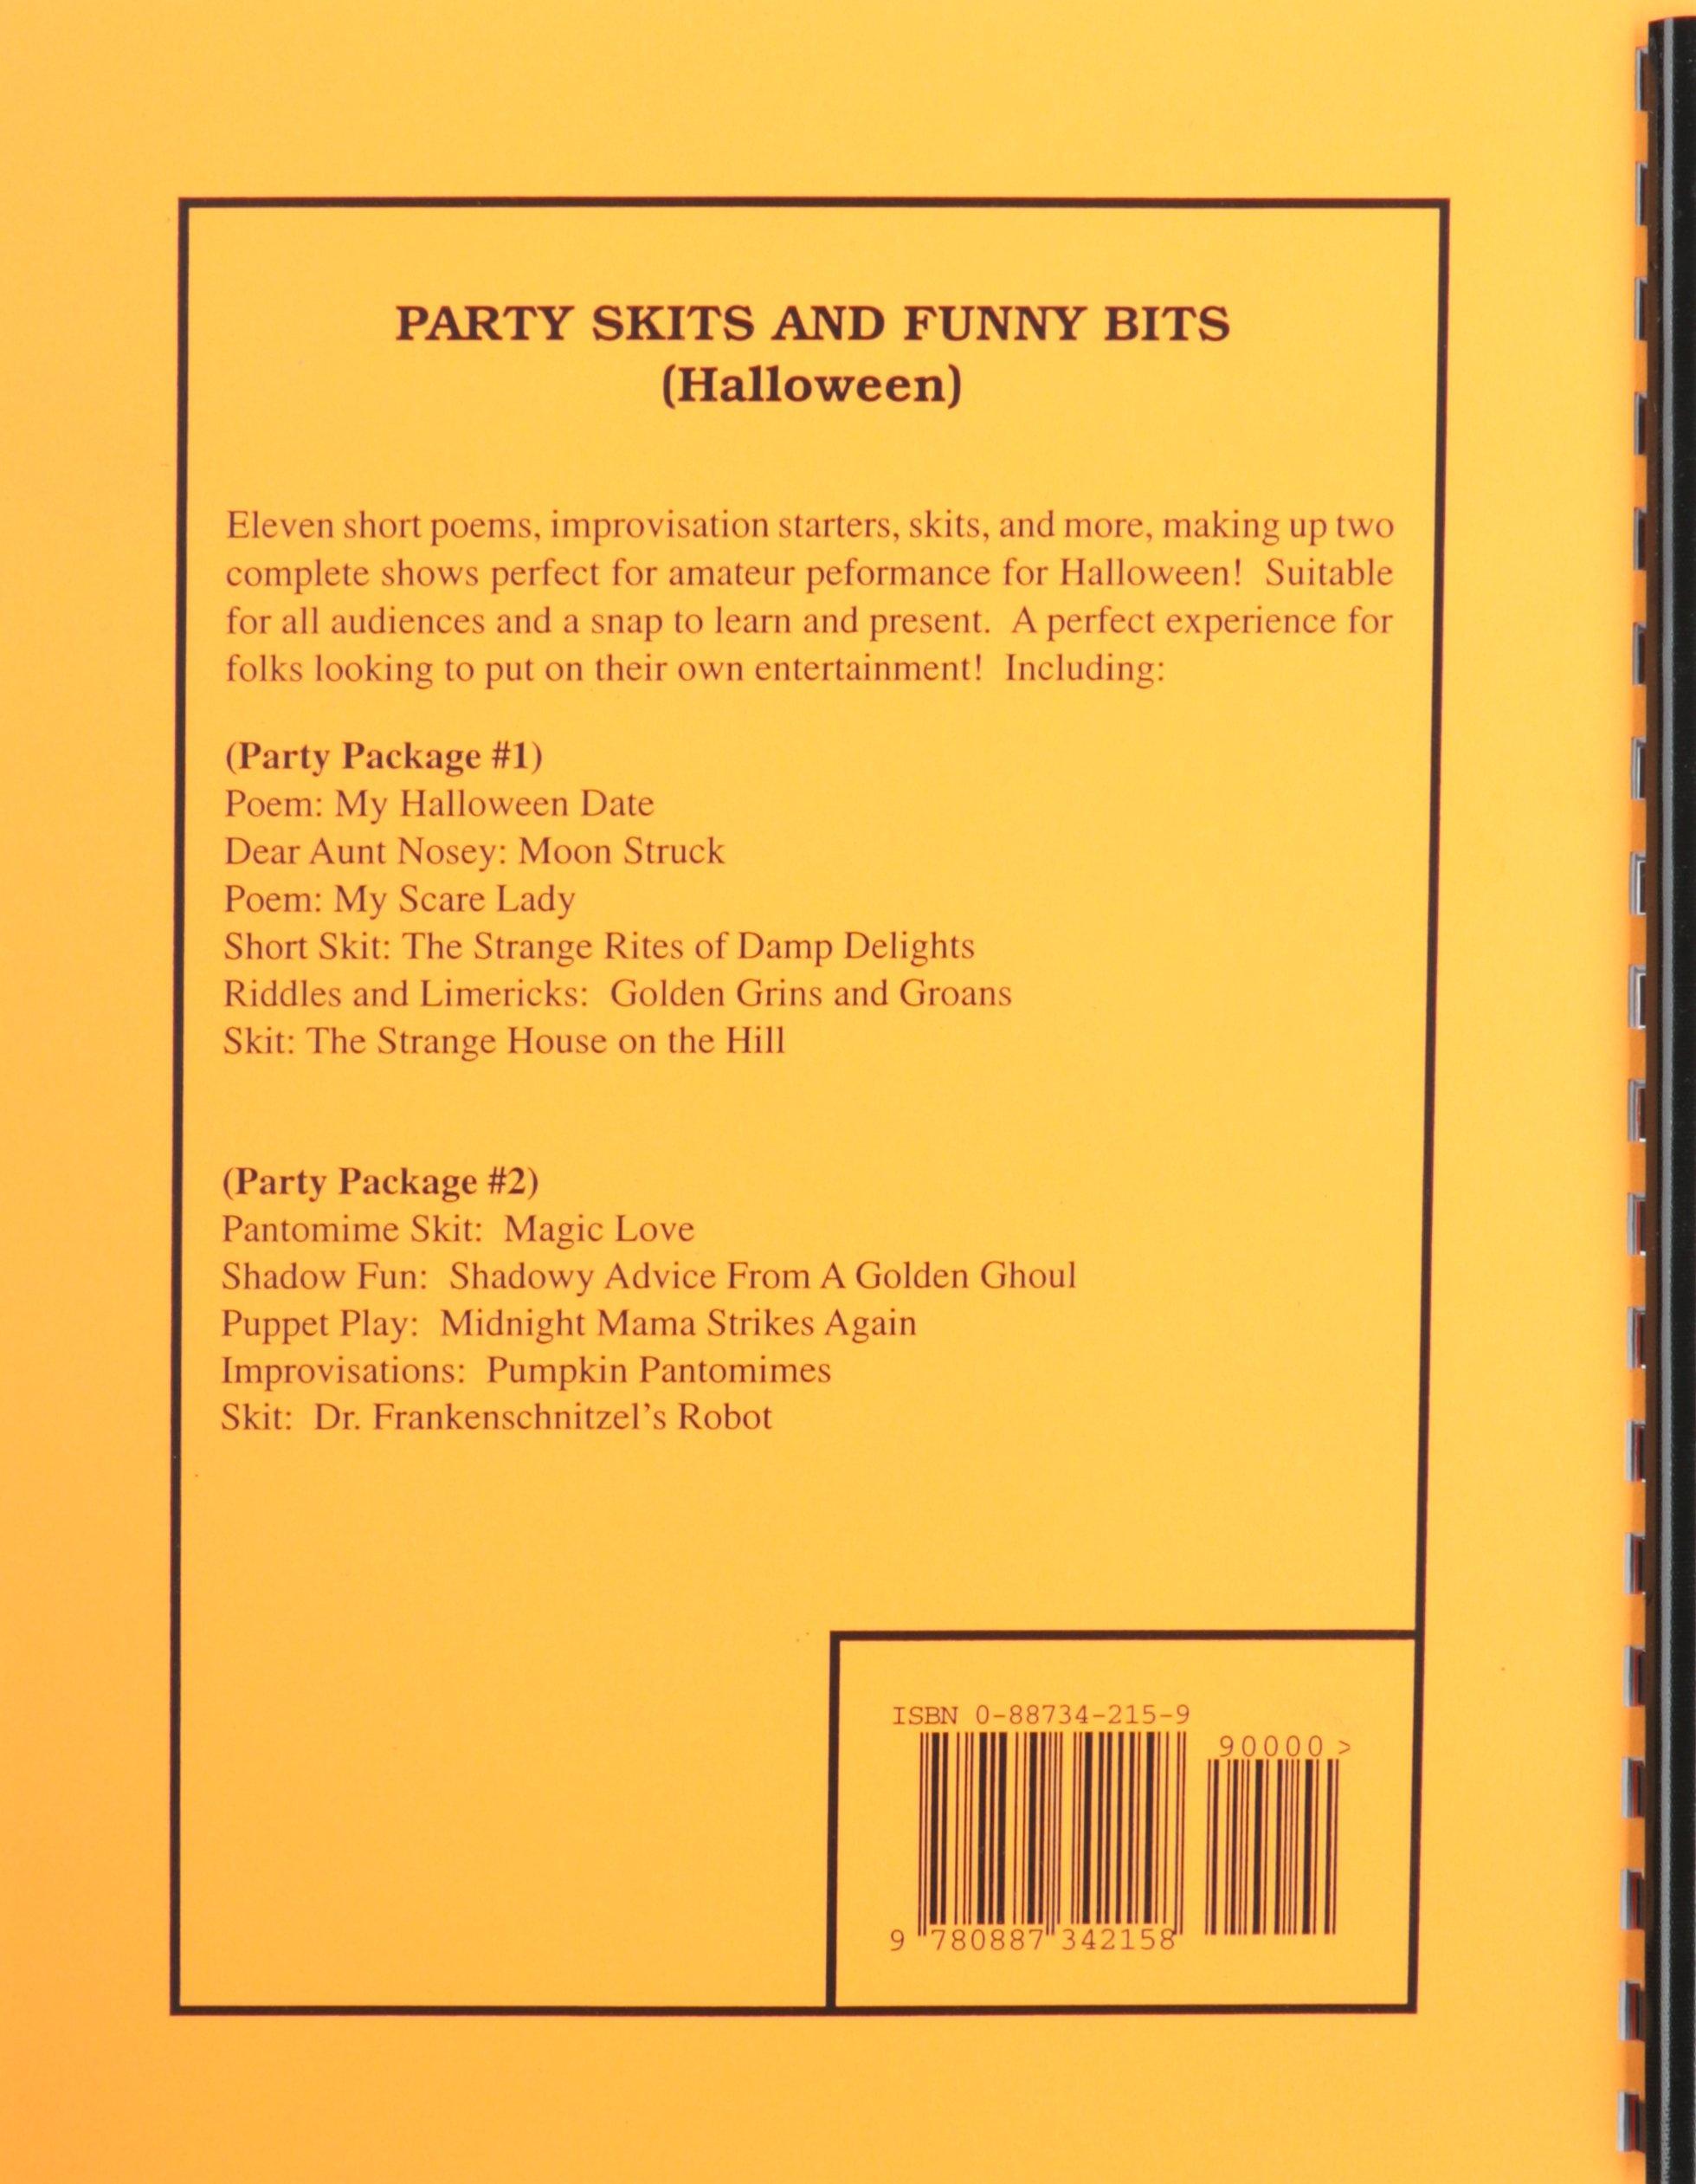 Party Skits and Funny Bits - Haloween: Amazon co uk: Milton